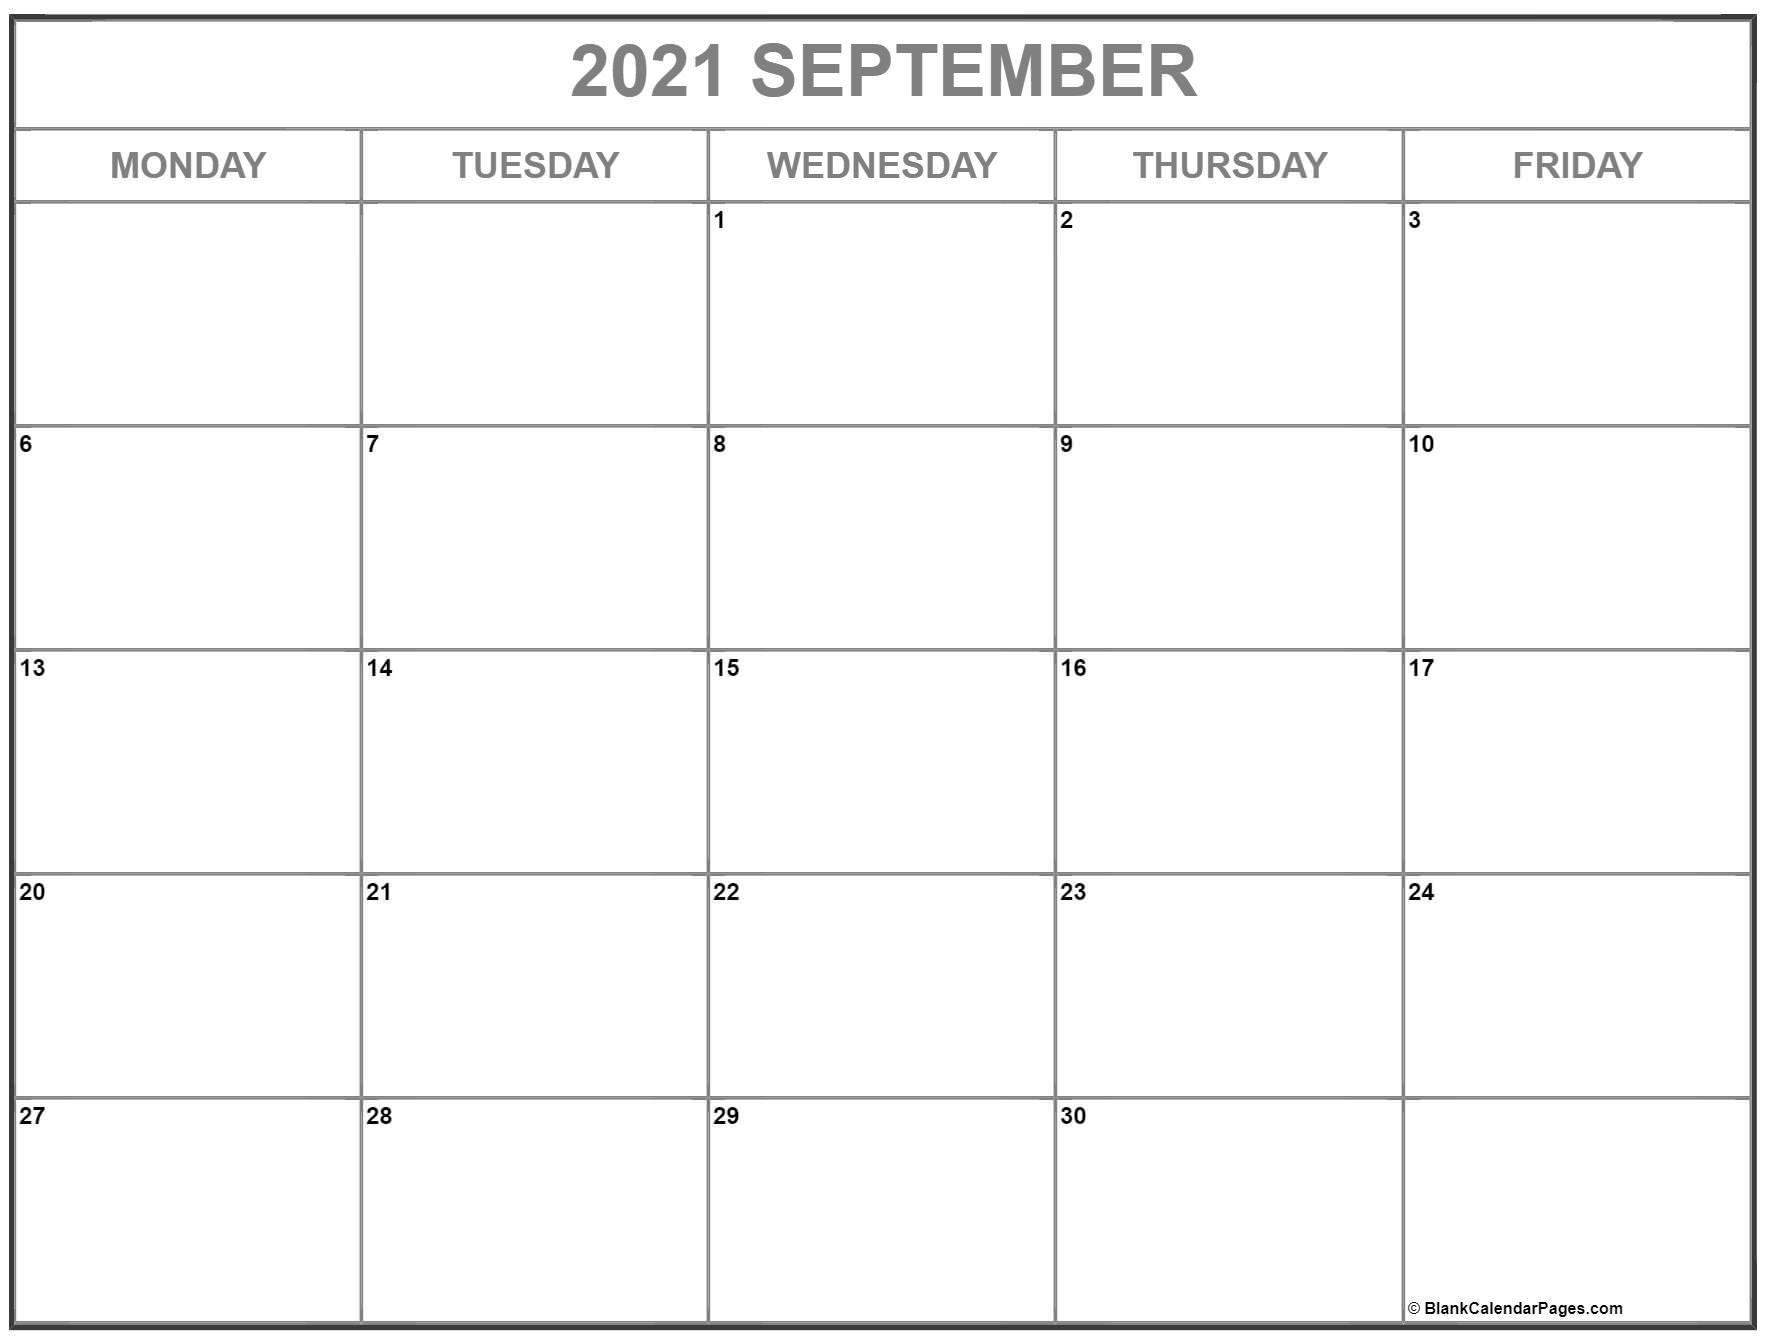 September 2021 Monday Calendar   Monday To Sunday September 2021 Calendar Starting Monday